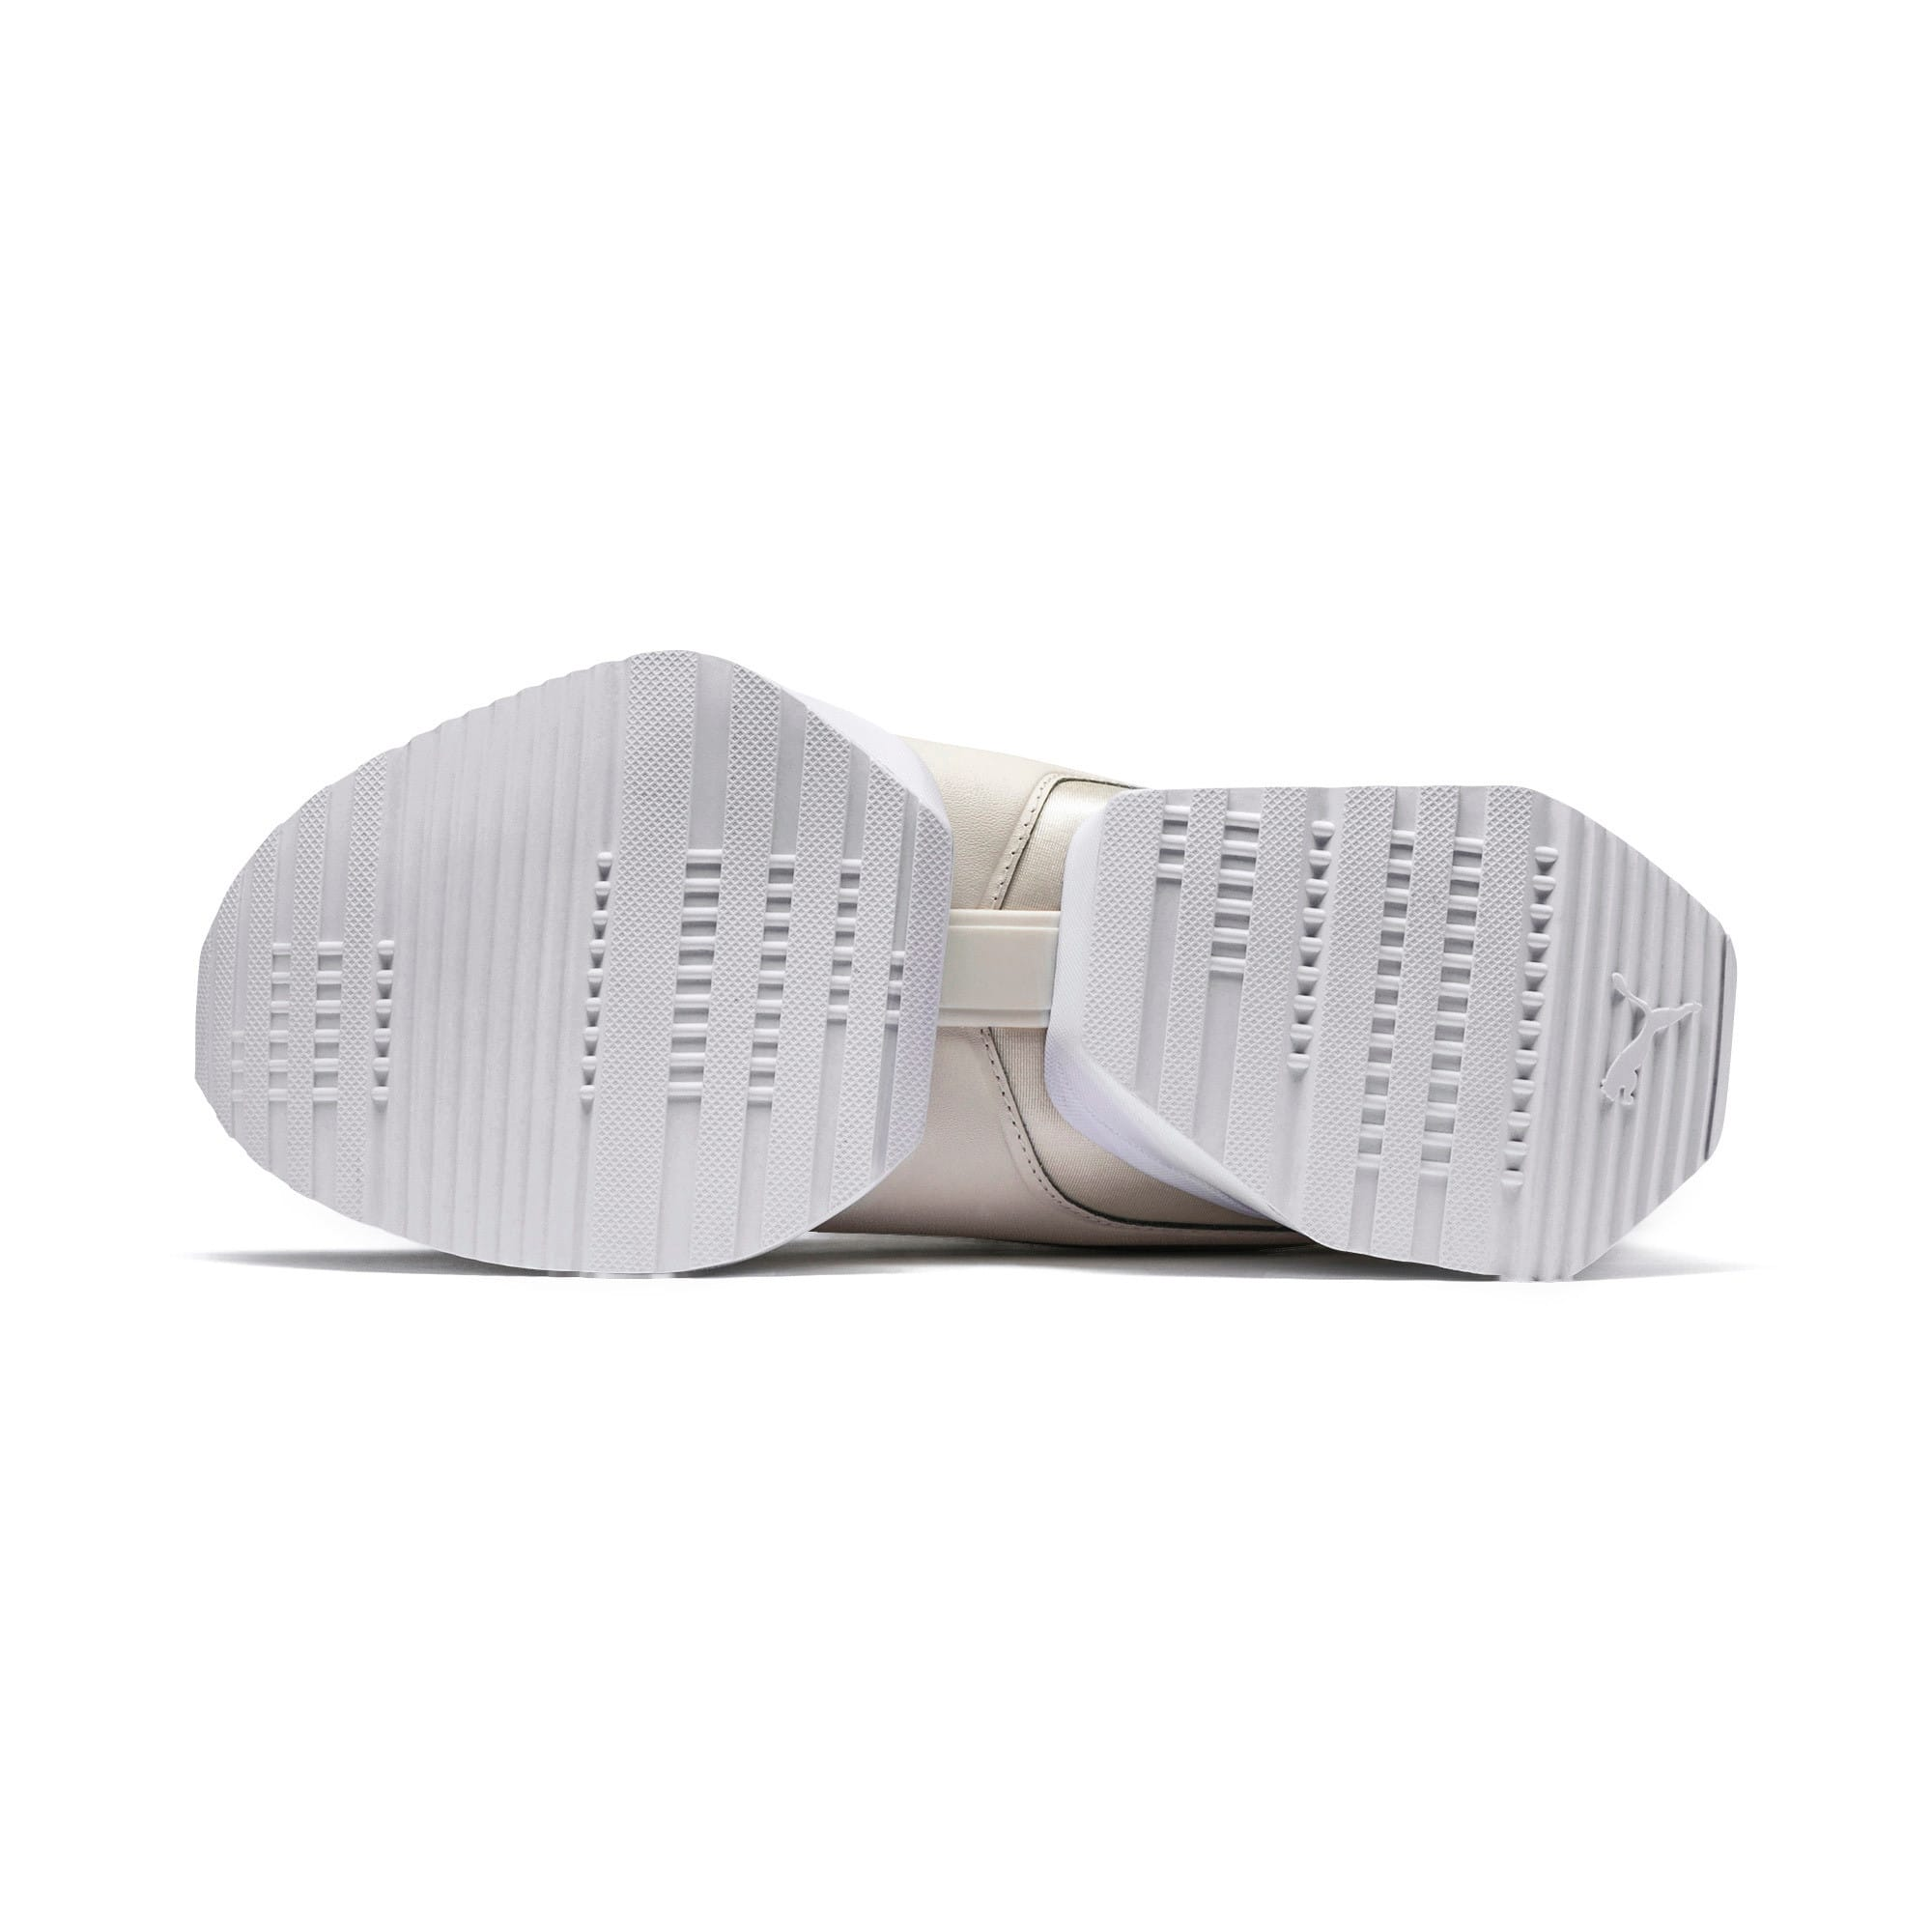 Thumbnail 5 of Muse Maia Knit Premium Women's Trainers, Whisper White-Puma White, medium